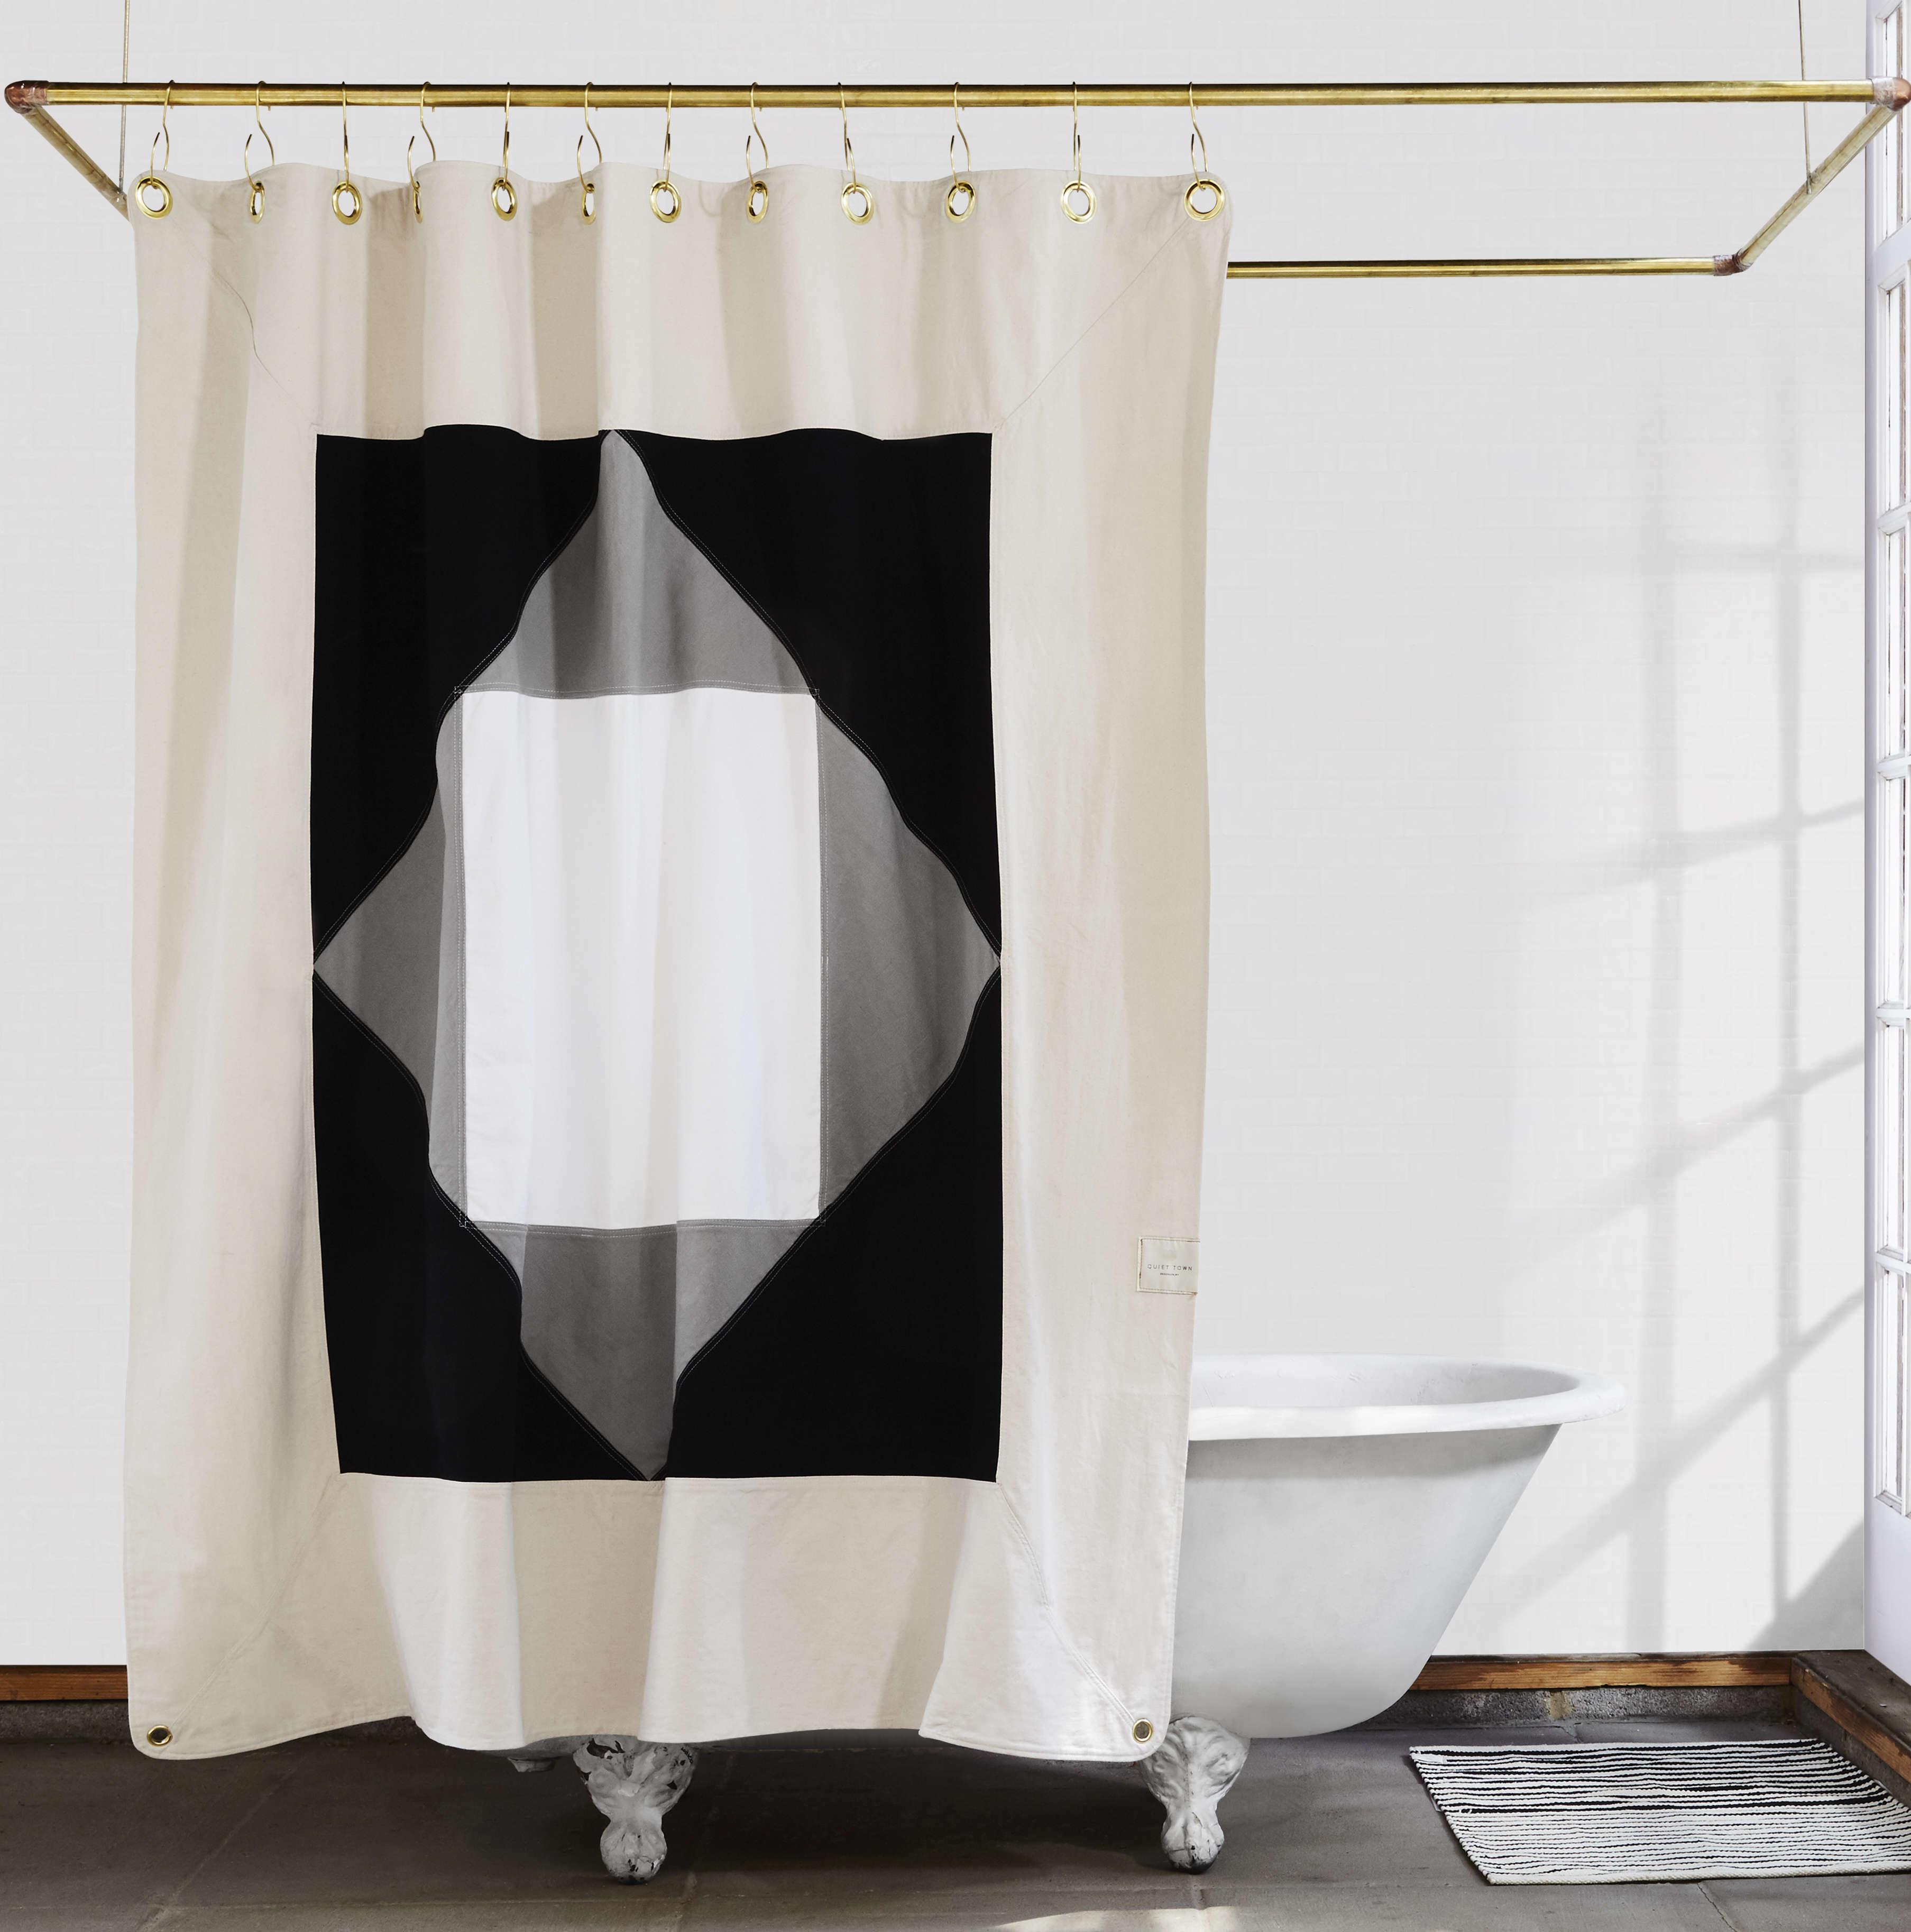 The Narlai Night Ride Organic Cotton Canvas Curtain